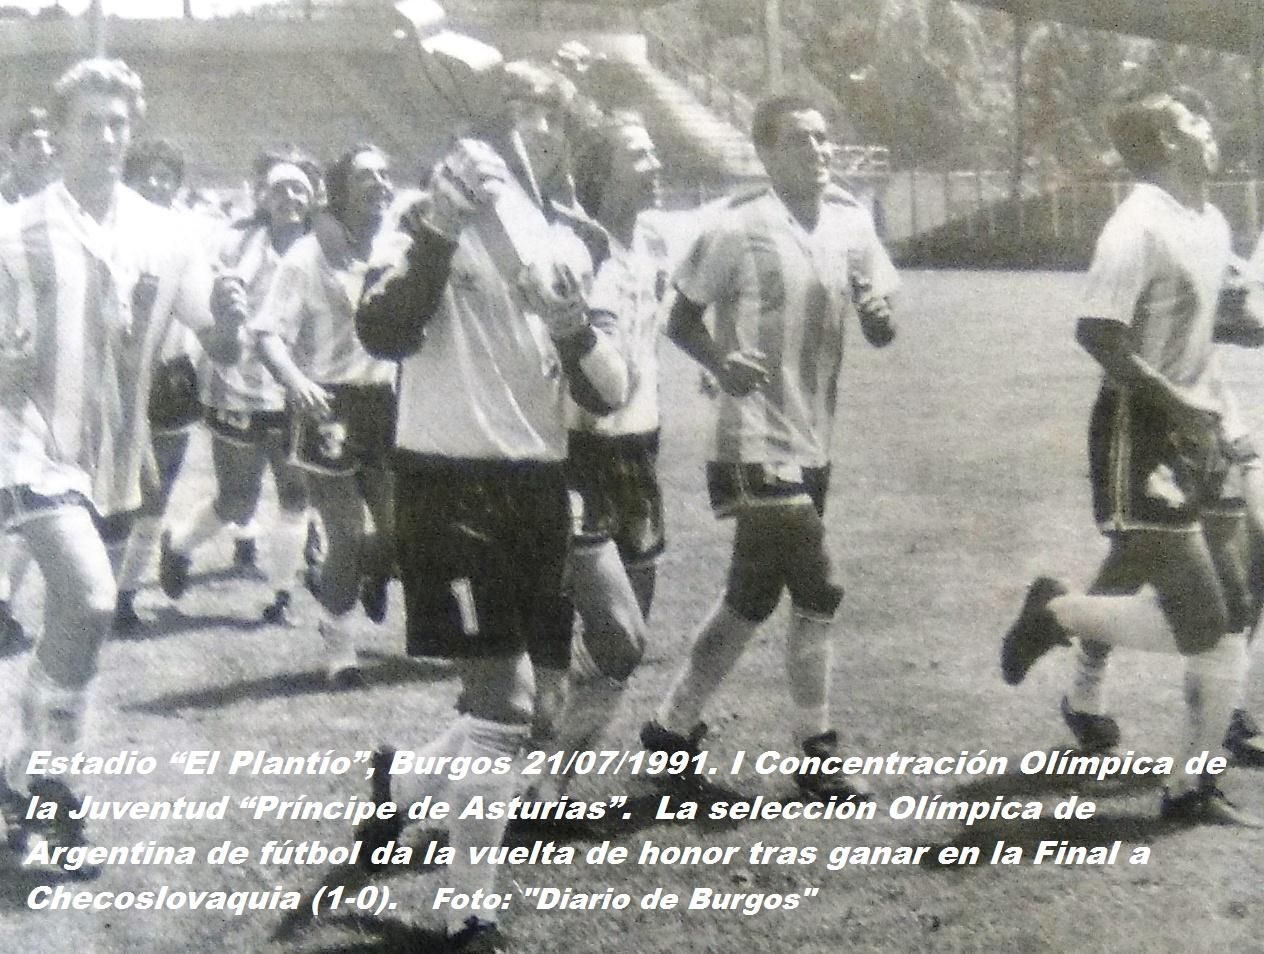 COJ´91.-Clausura.-El-Plantío-Burgos-21-07-1991-2